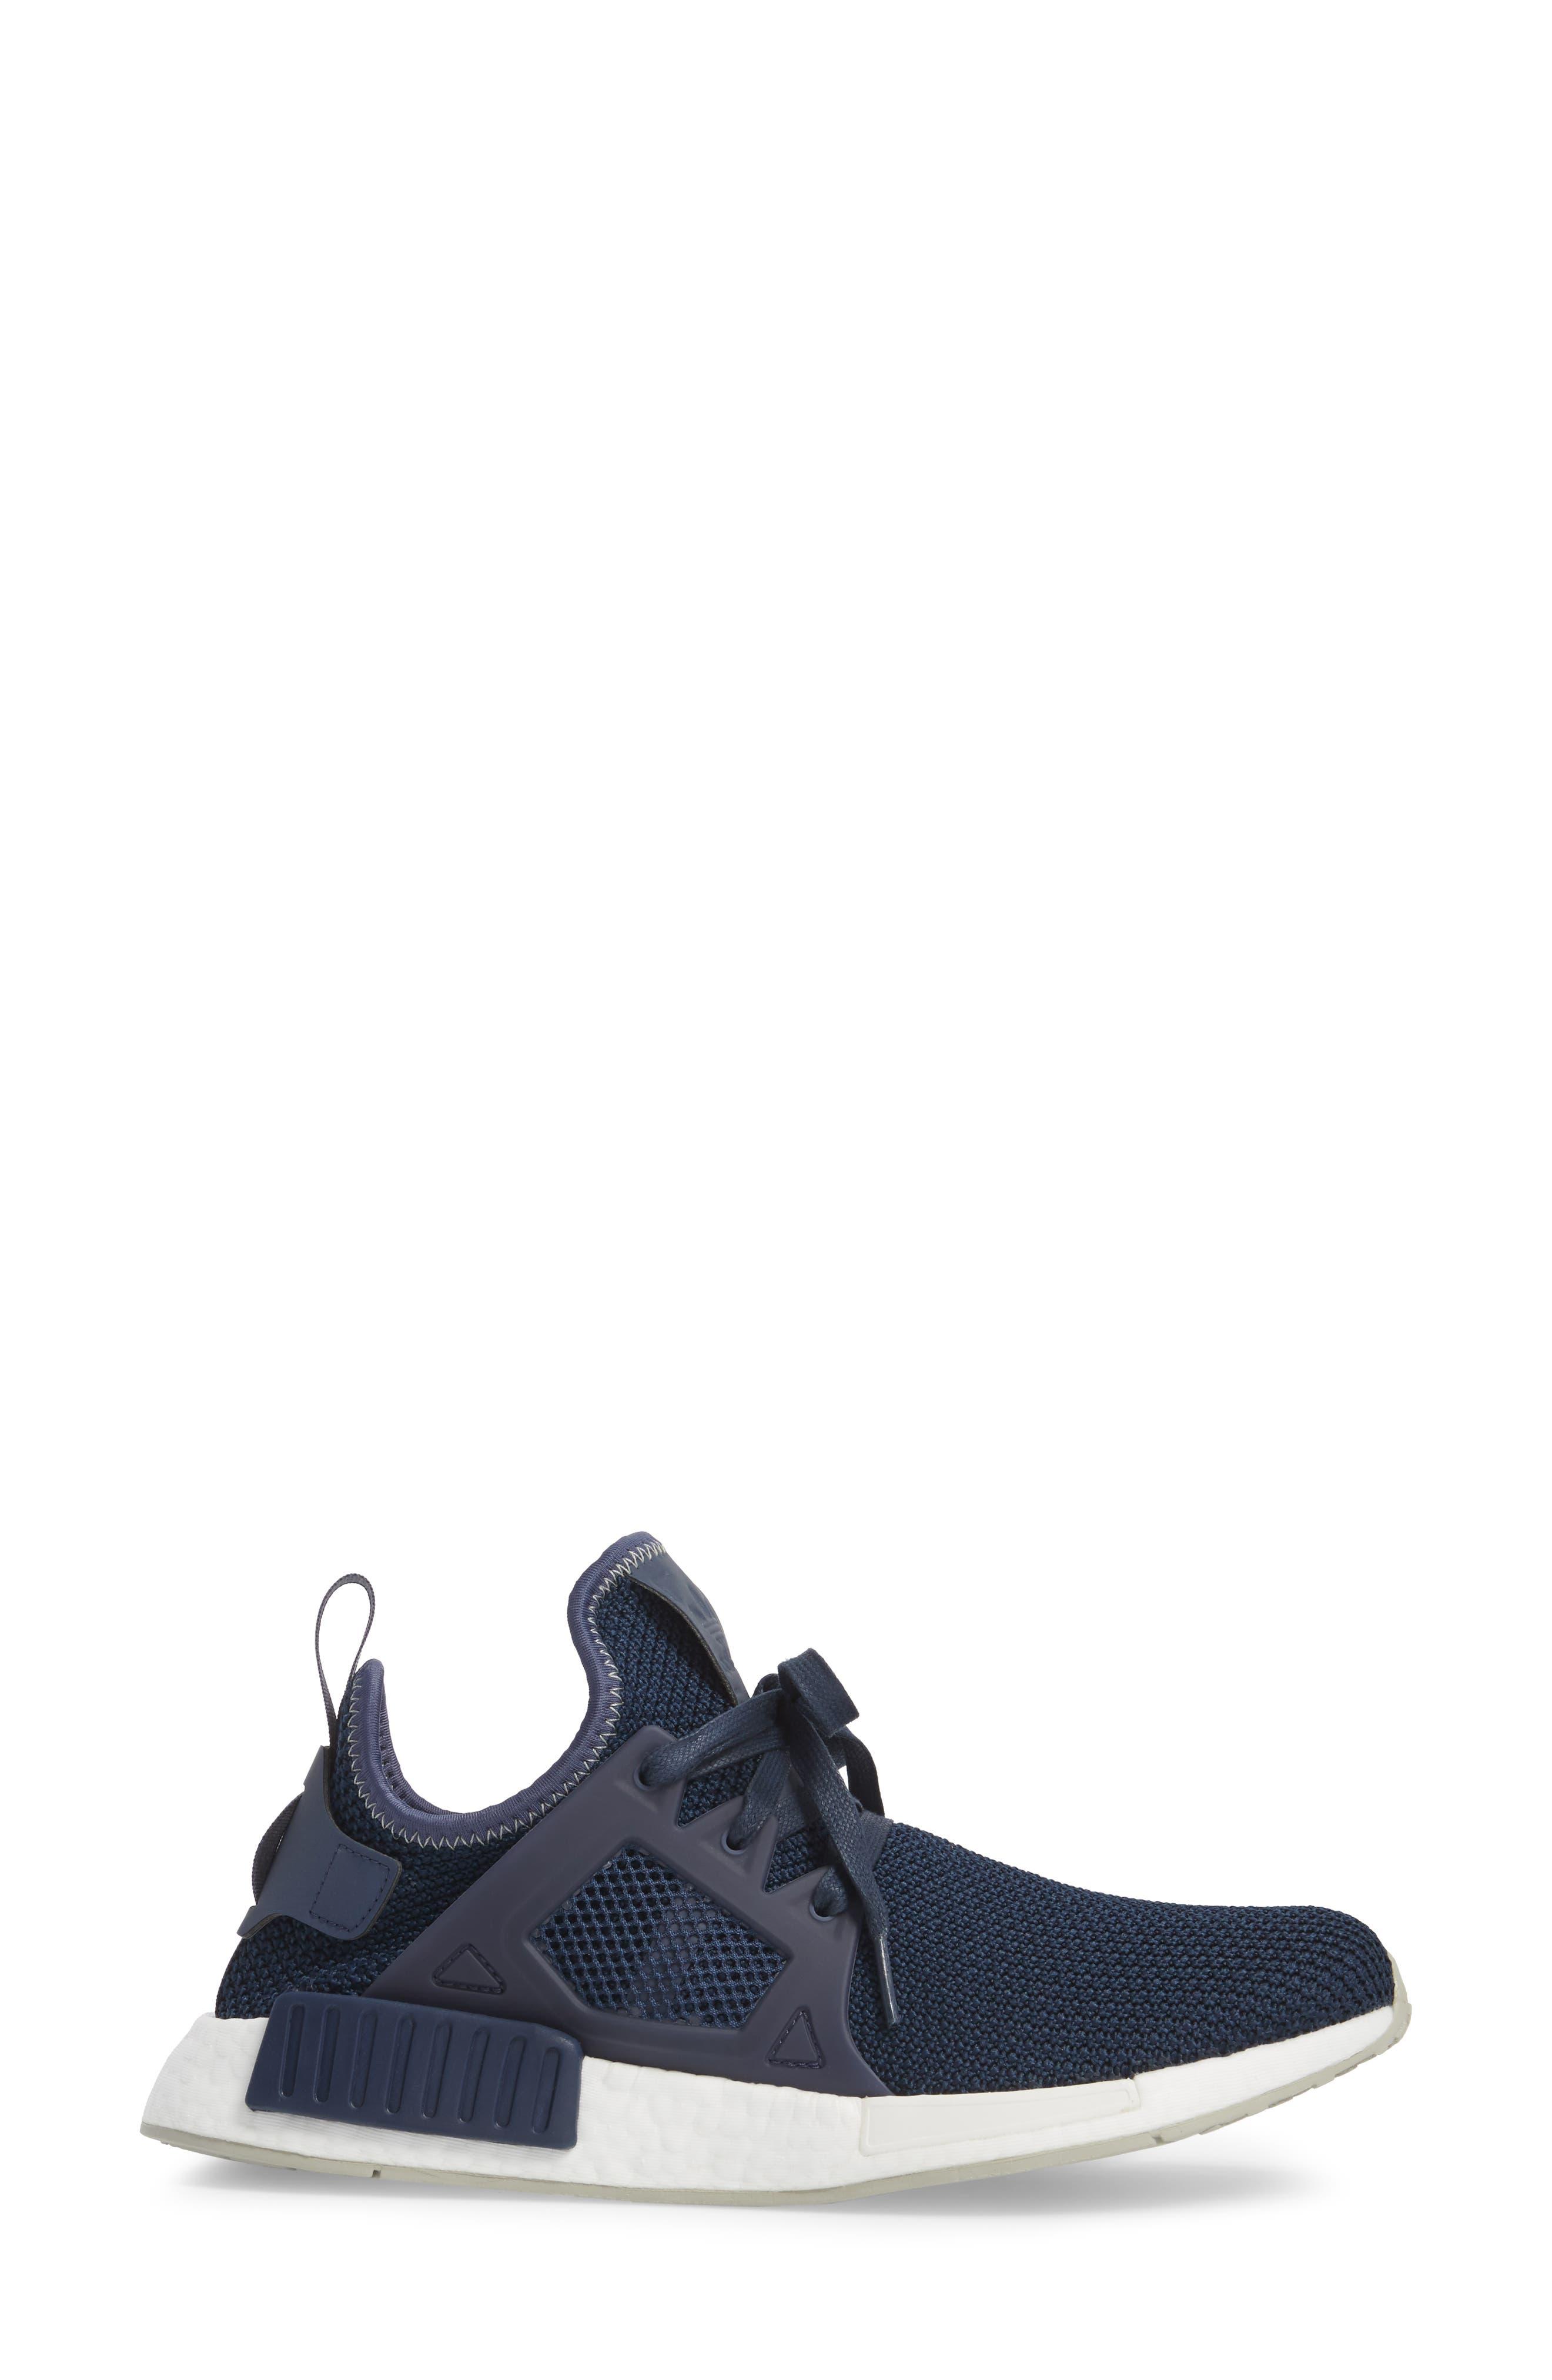 NMD XR1 Athletic Shoe,                             Alternate thumbnail 3, color,                             Trace Blue/ Sesame